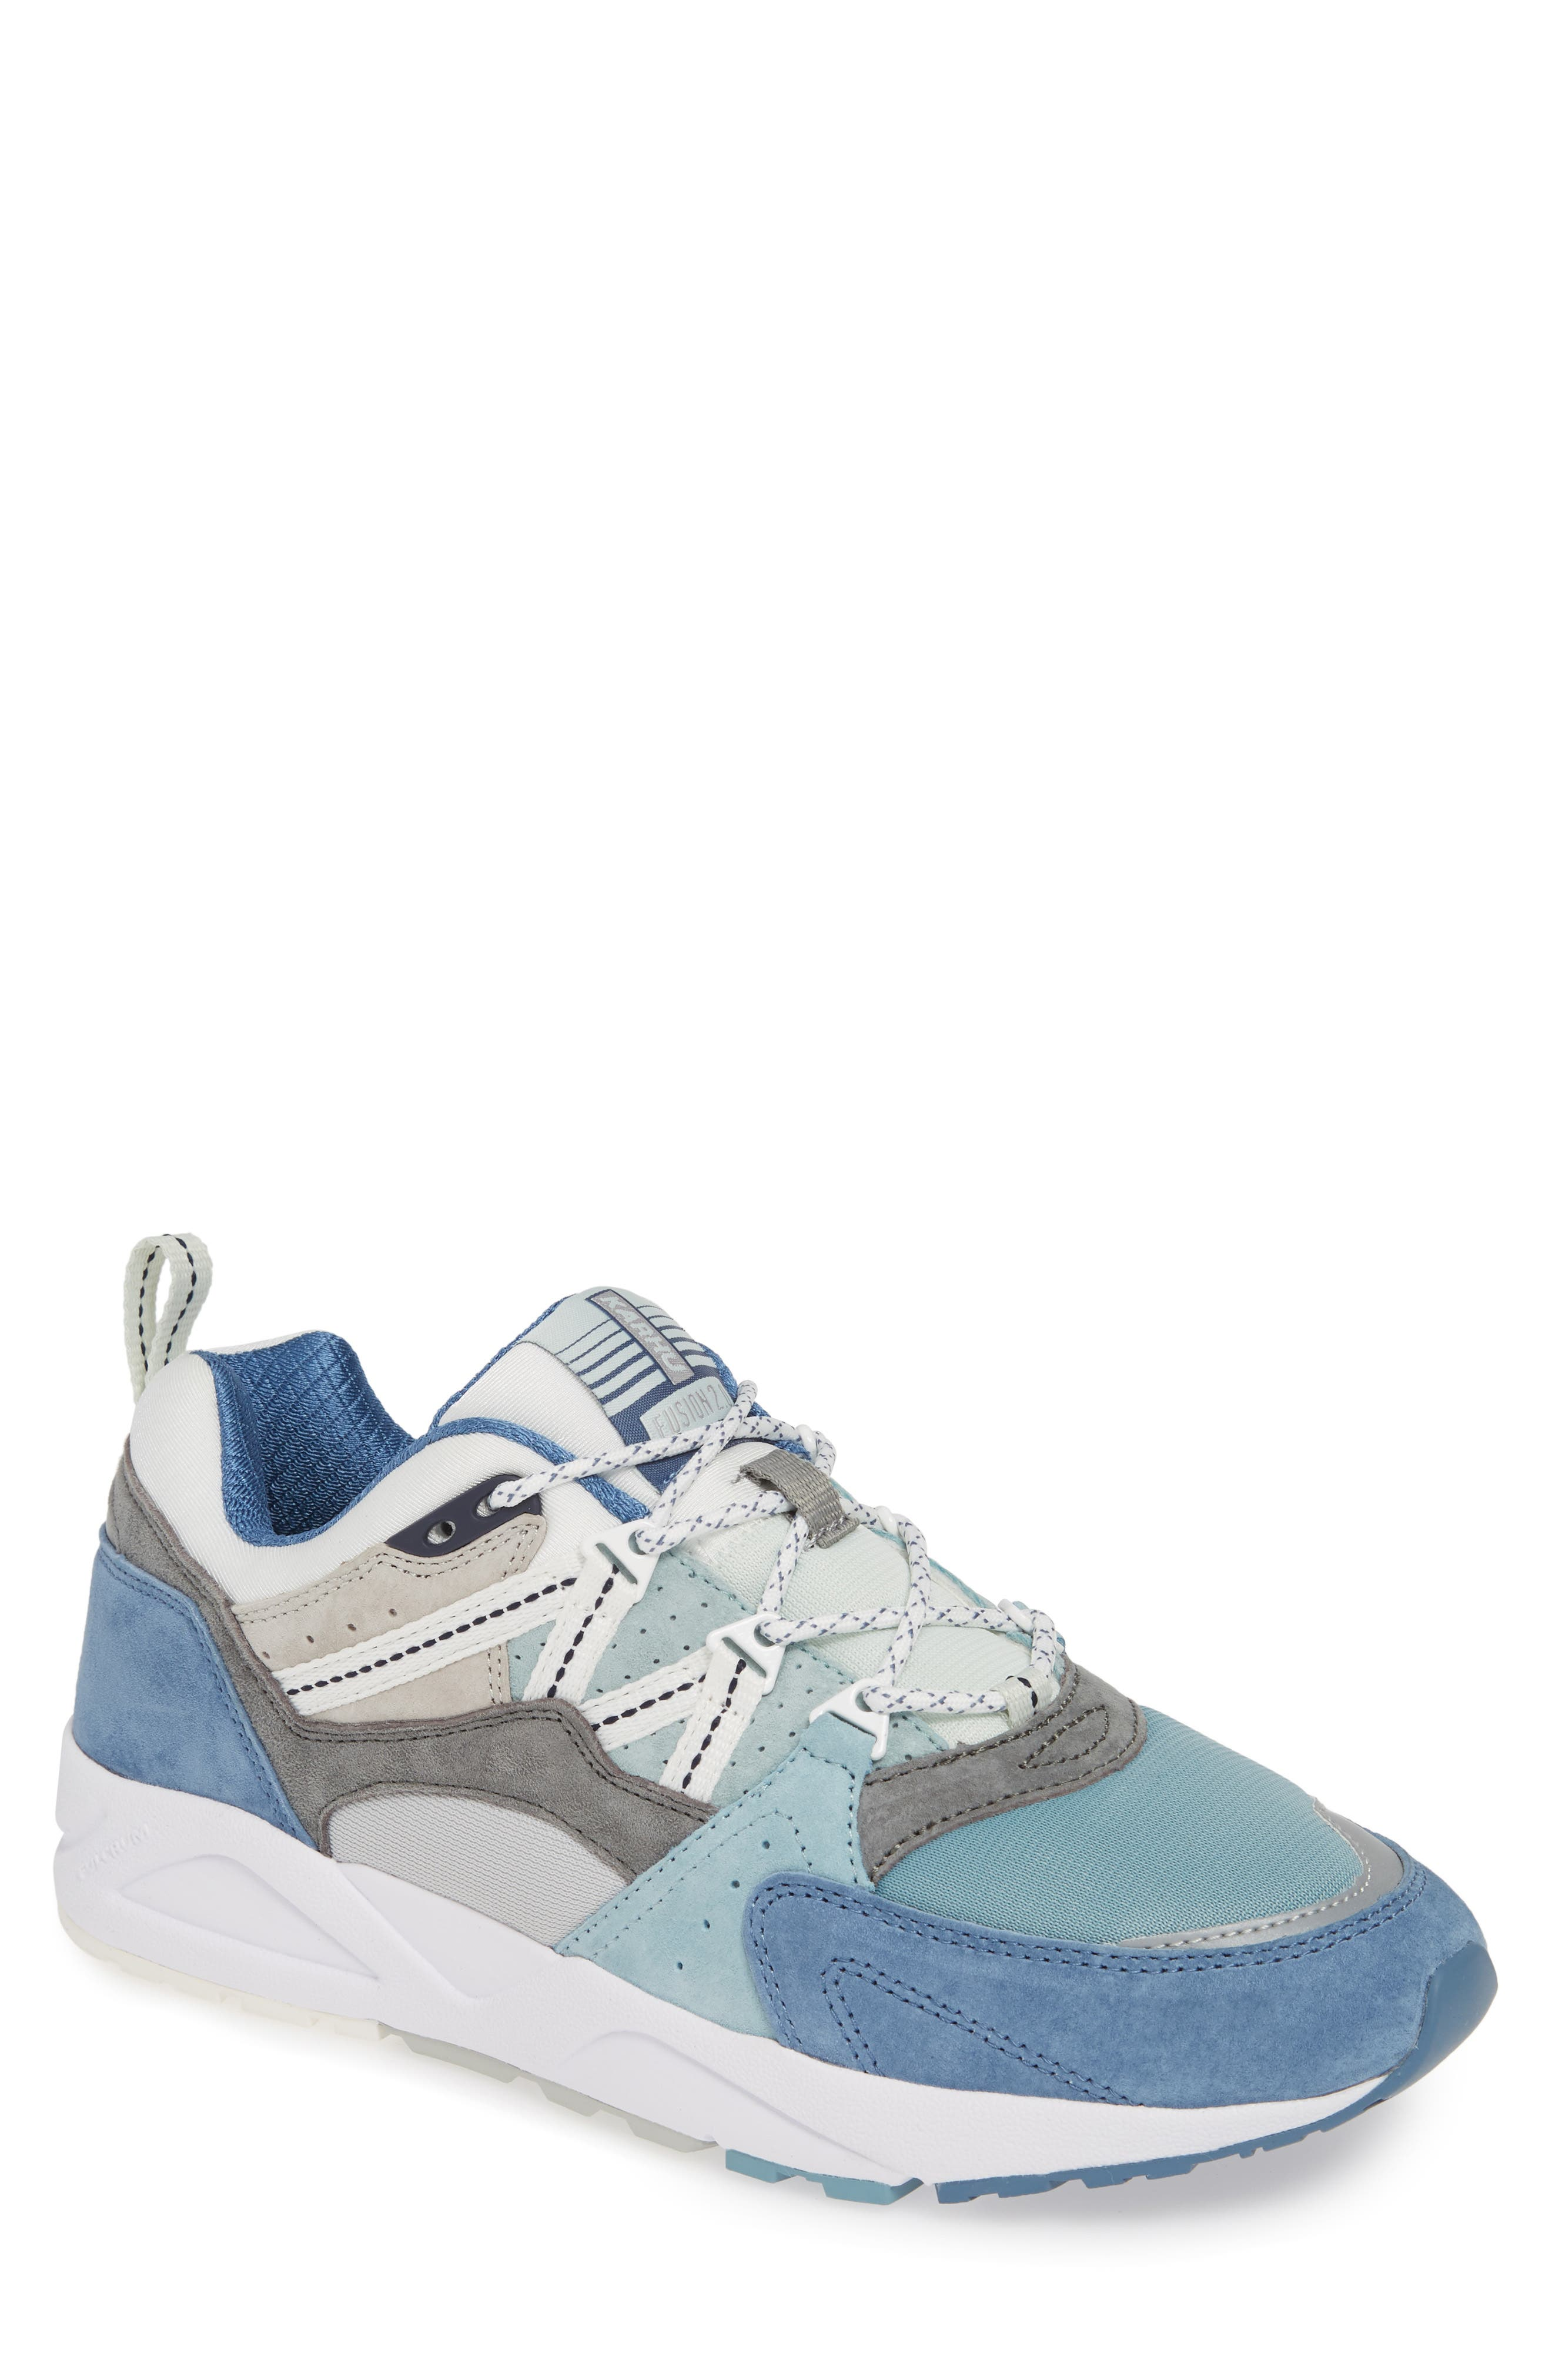 Fusion 2.0 Sneaker,                             Main thumbnail 1, color,                             210